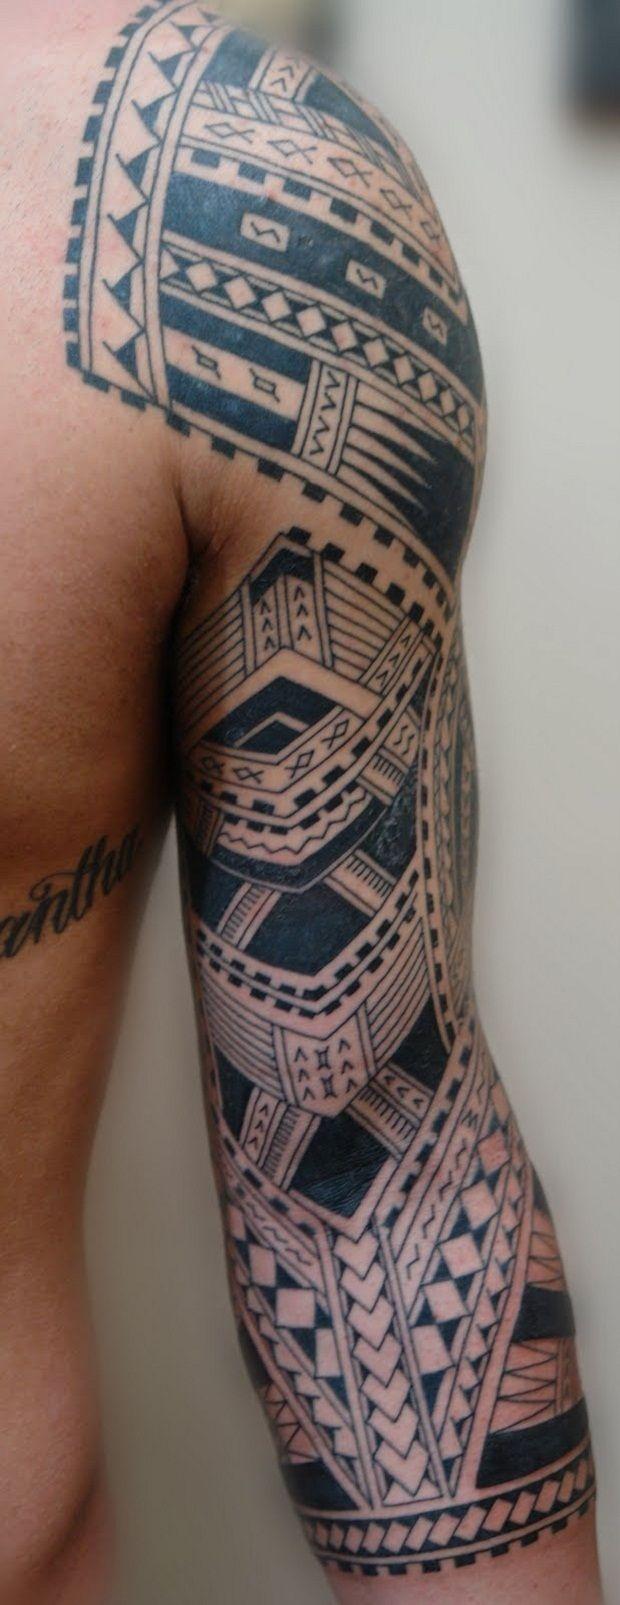 Tribal Sleeve Tattoo Design For Men #1 • Tattoo Ideas Zone